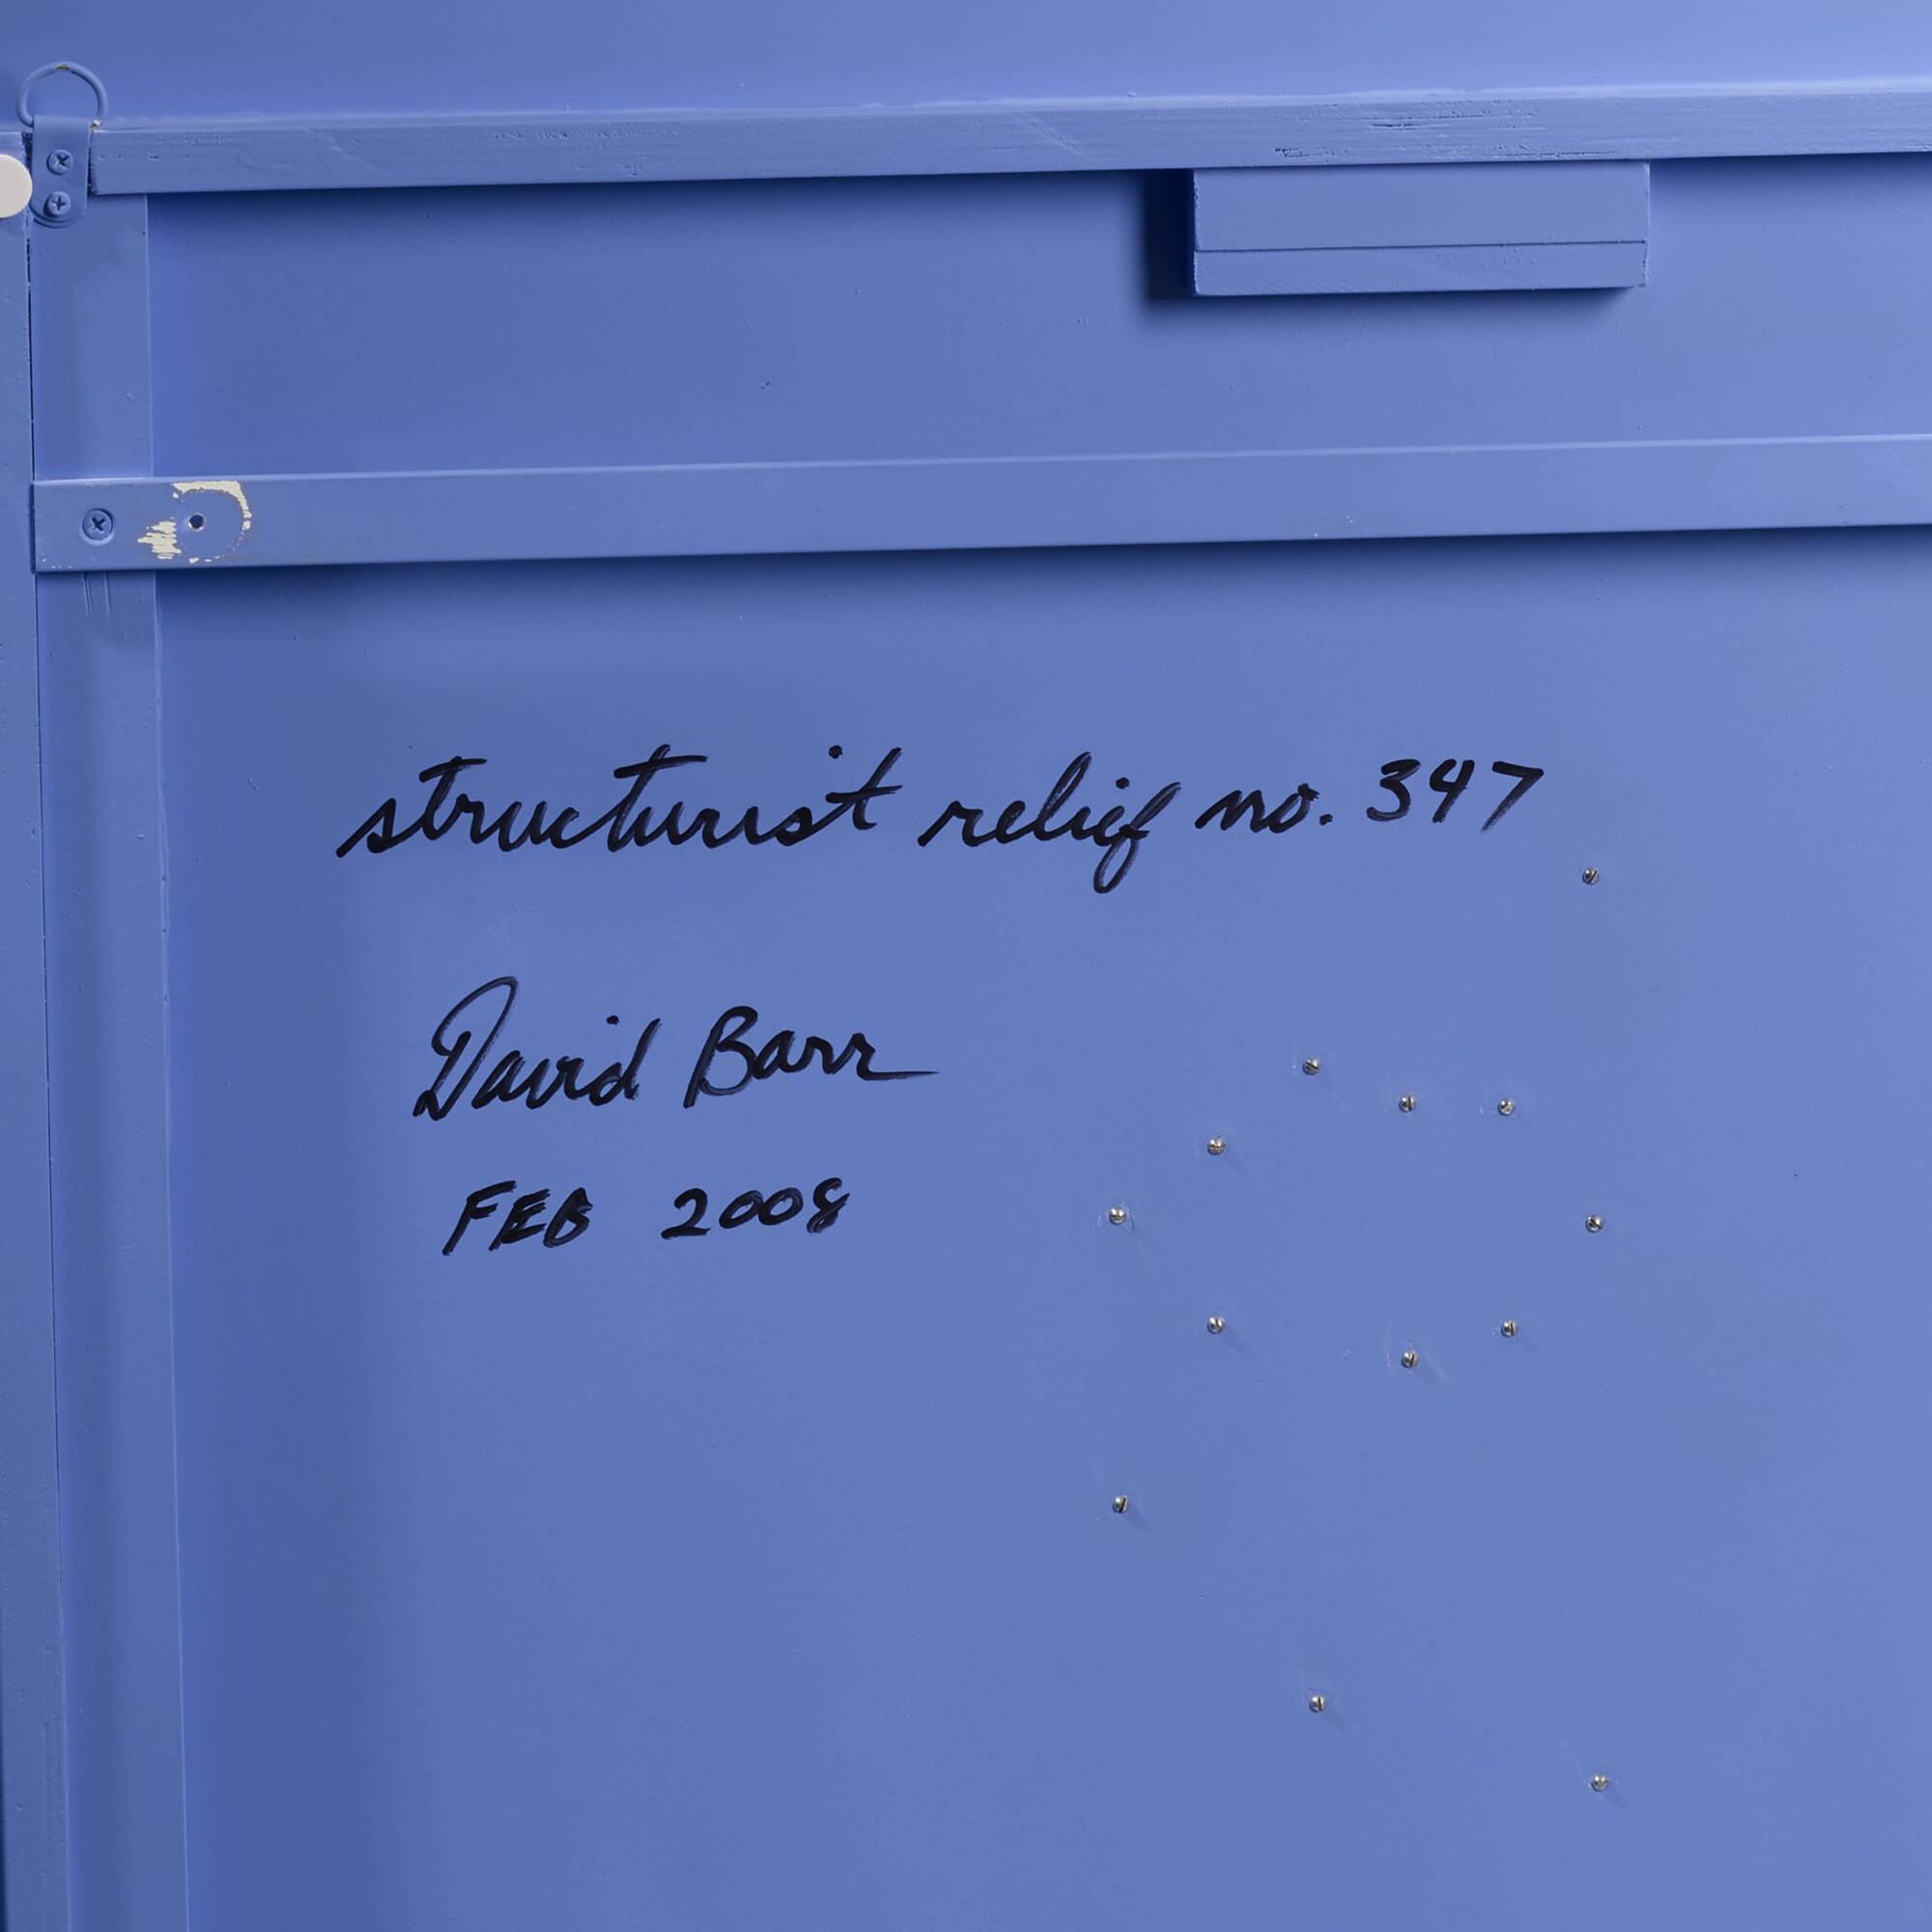 116: David Barr / Structurist Relief No. 347 (4 of 4)